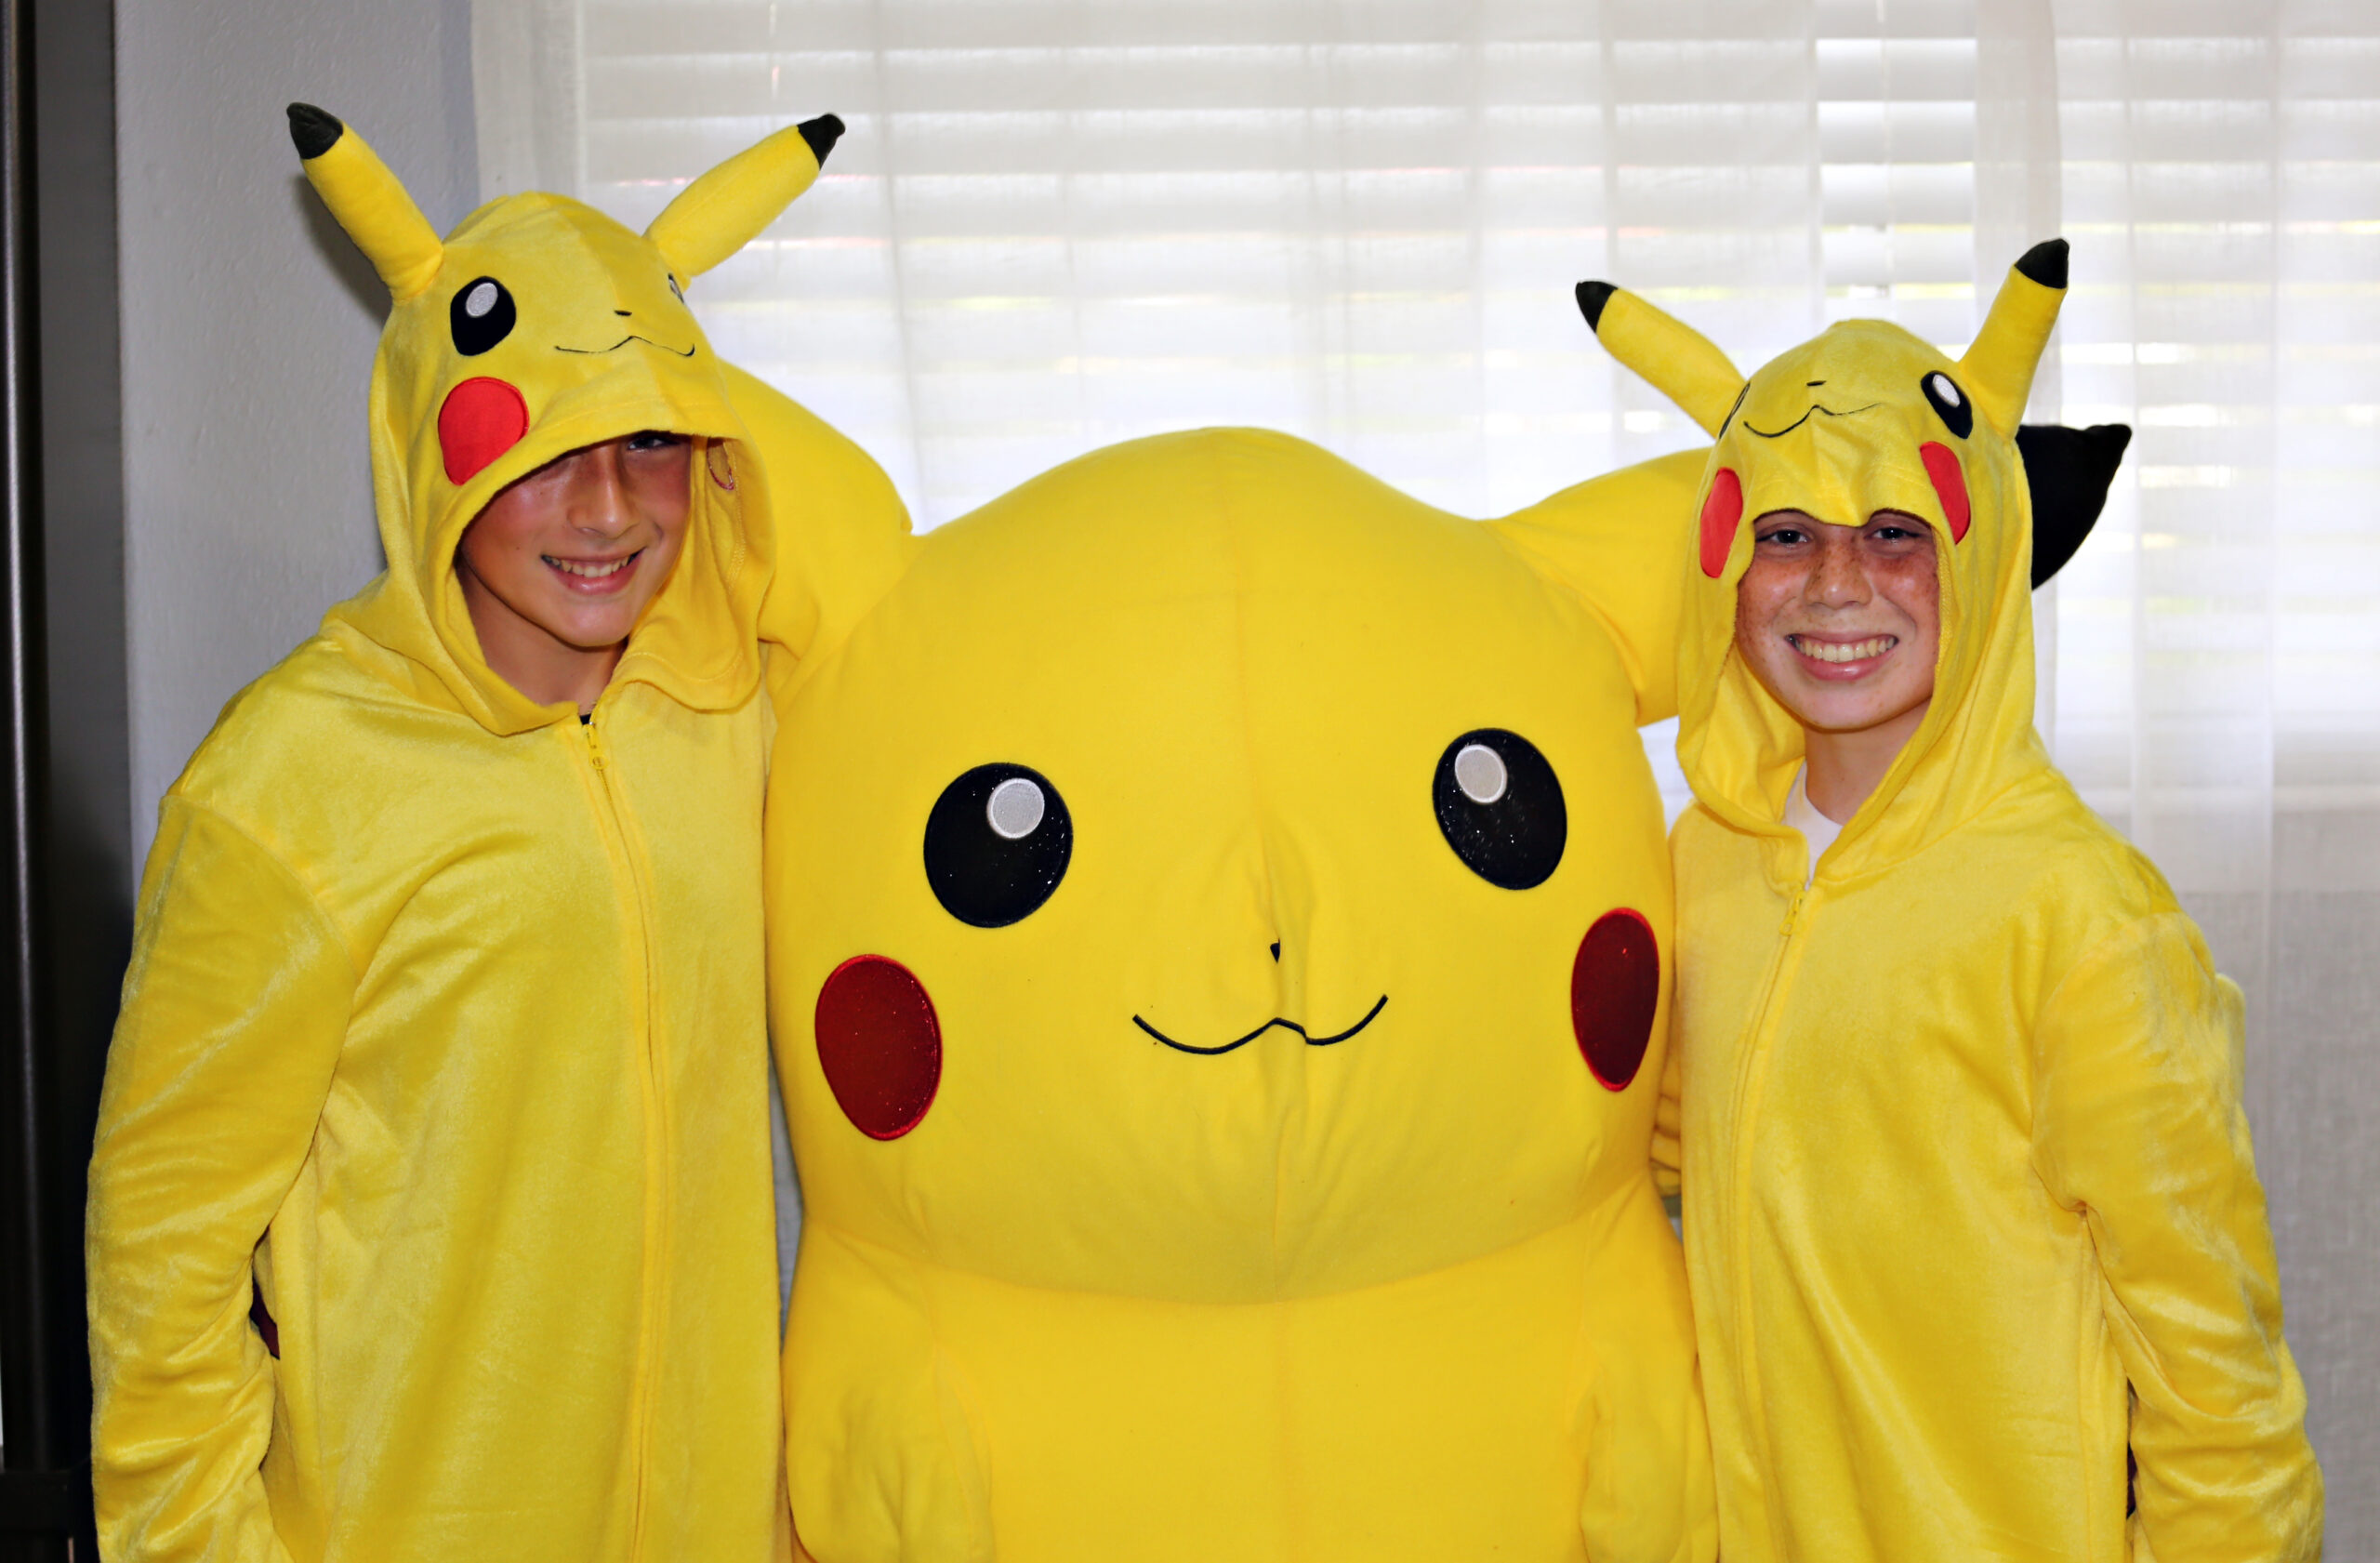 Pokémon's 'MastersEX' Hashtag Turns Bawdy in Latest Twitter Marketing Failure